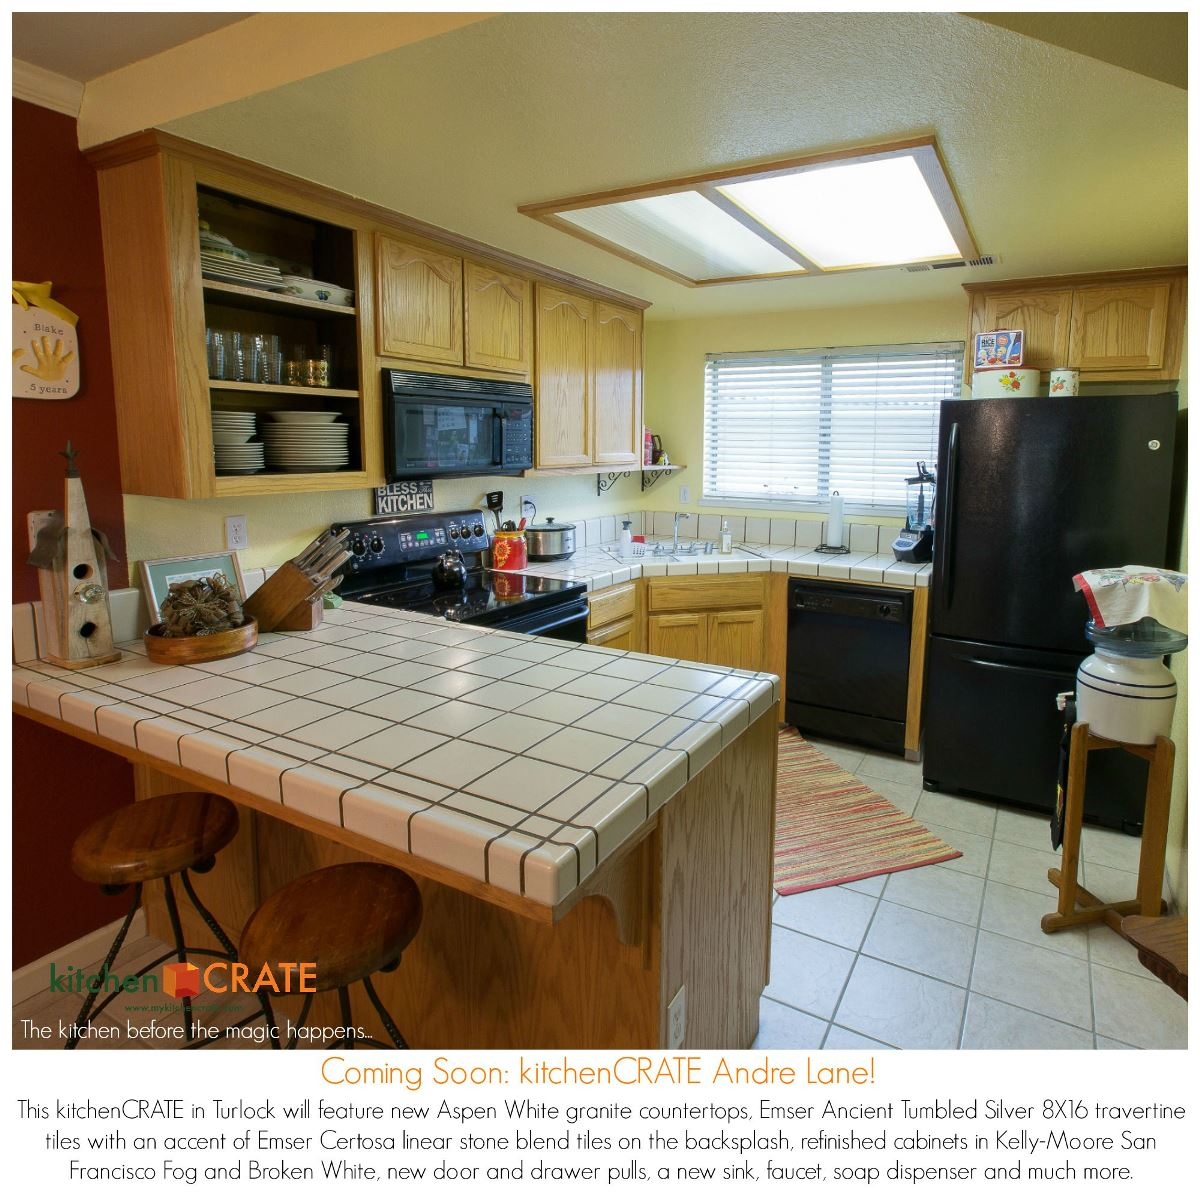 Kitchen Remodel Begins KitchenCRATE Andre Lane In Turlock CA - Bathroom remodel turlock ca